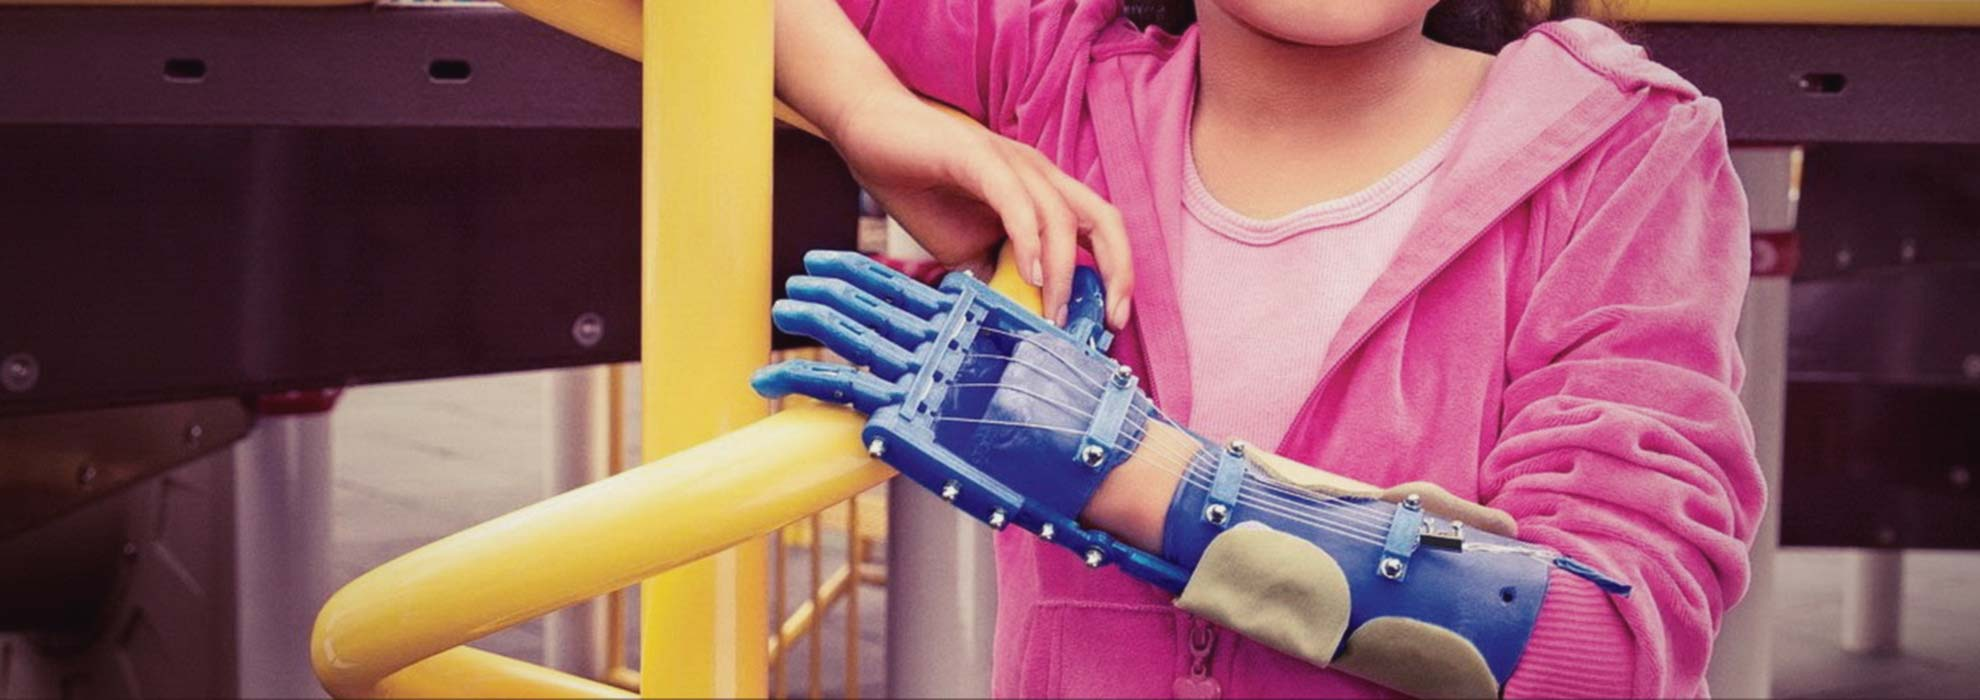 3D печать медицина протез